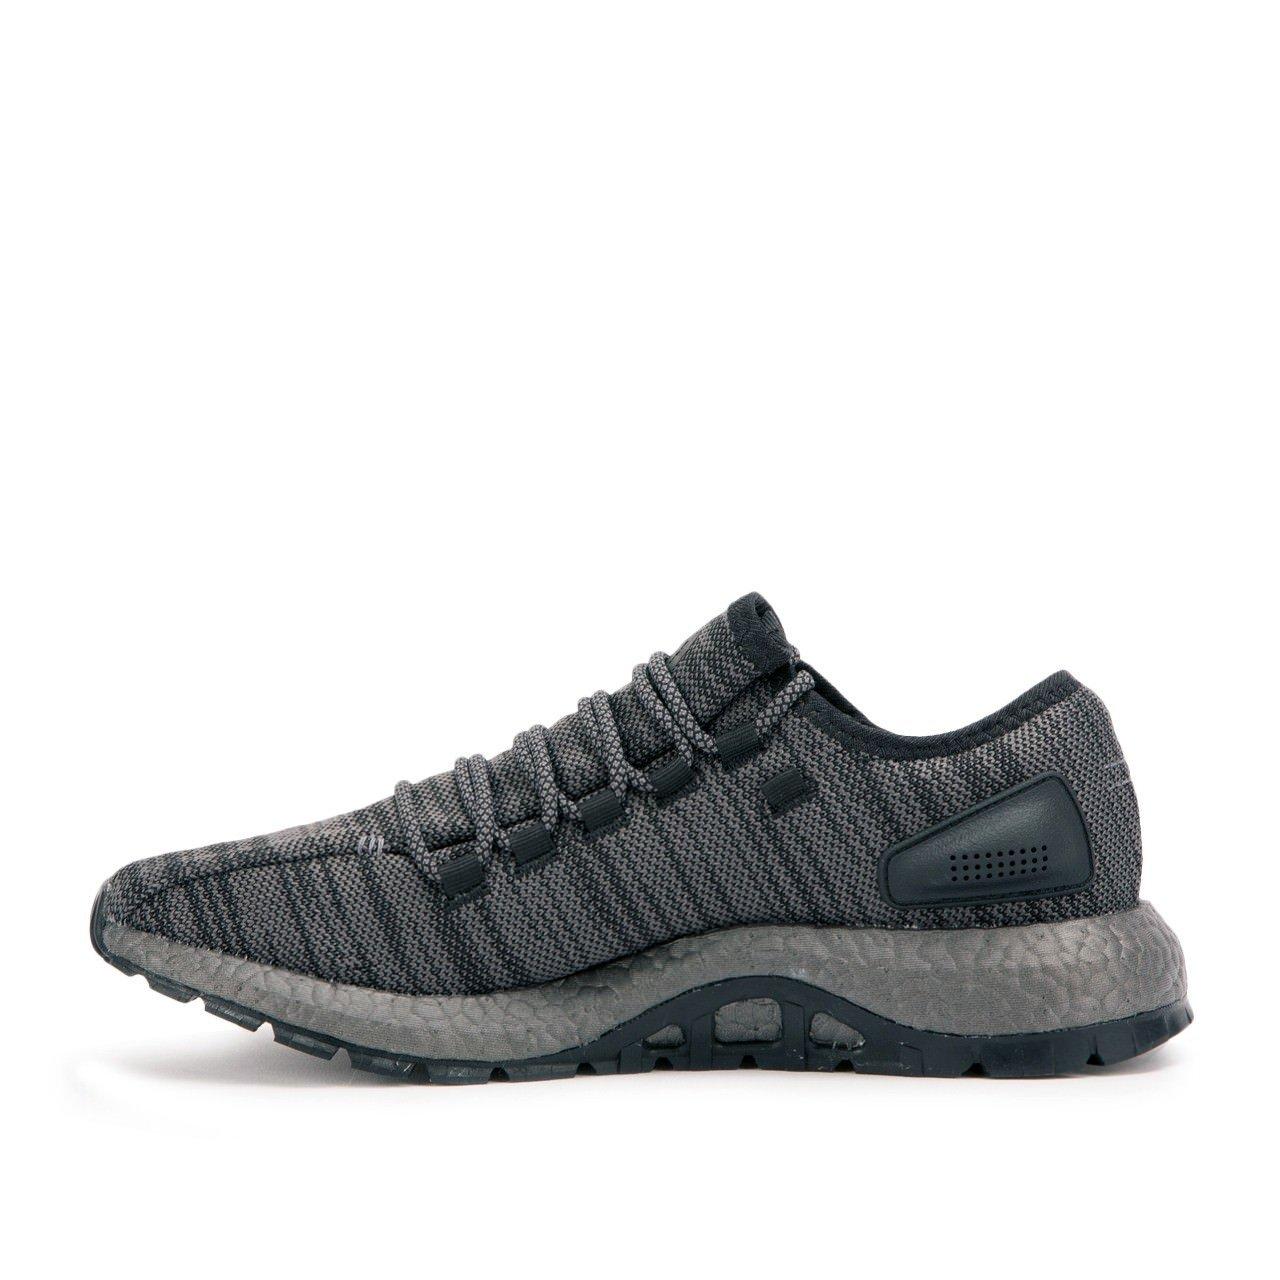 adidas Men's Pureboost ATR Running Shoe B06XWZ6GTD 17 D(M) US|Black/Dgh Solid Grey/Trace Grey/Metallic